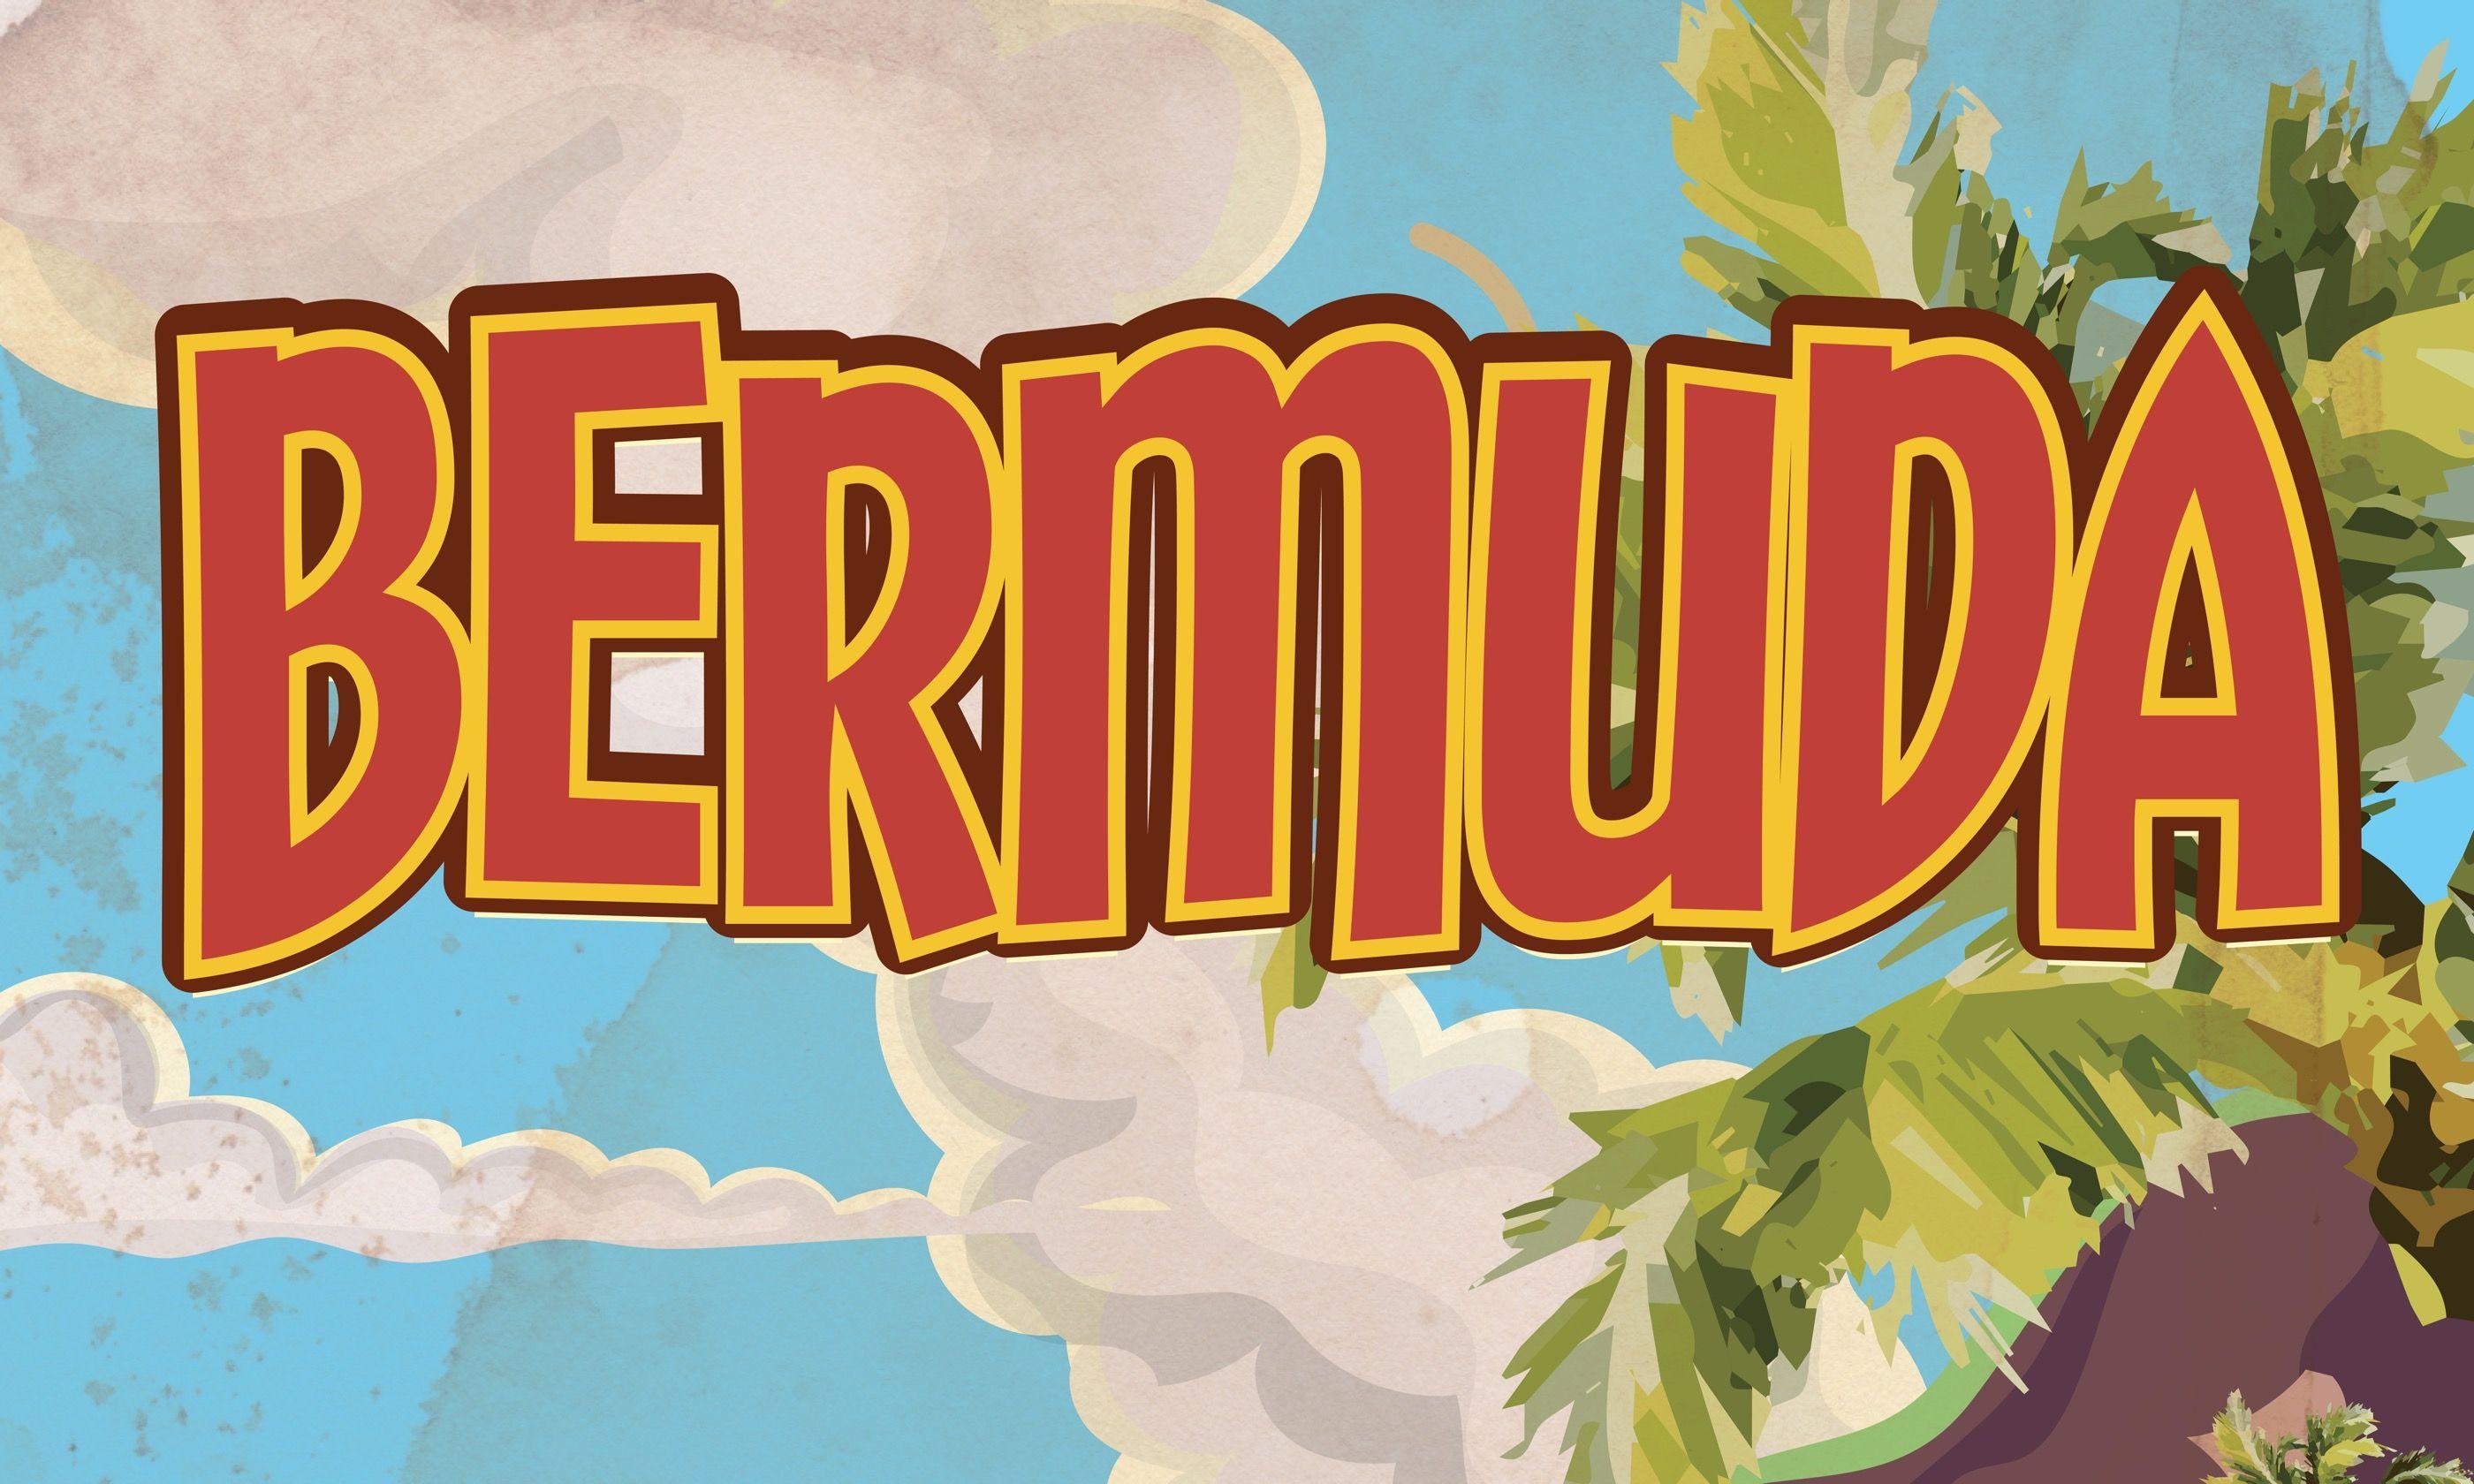 Vintage Bermuda poster (Shutterstock.com)